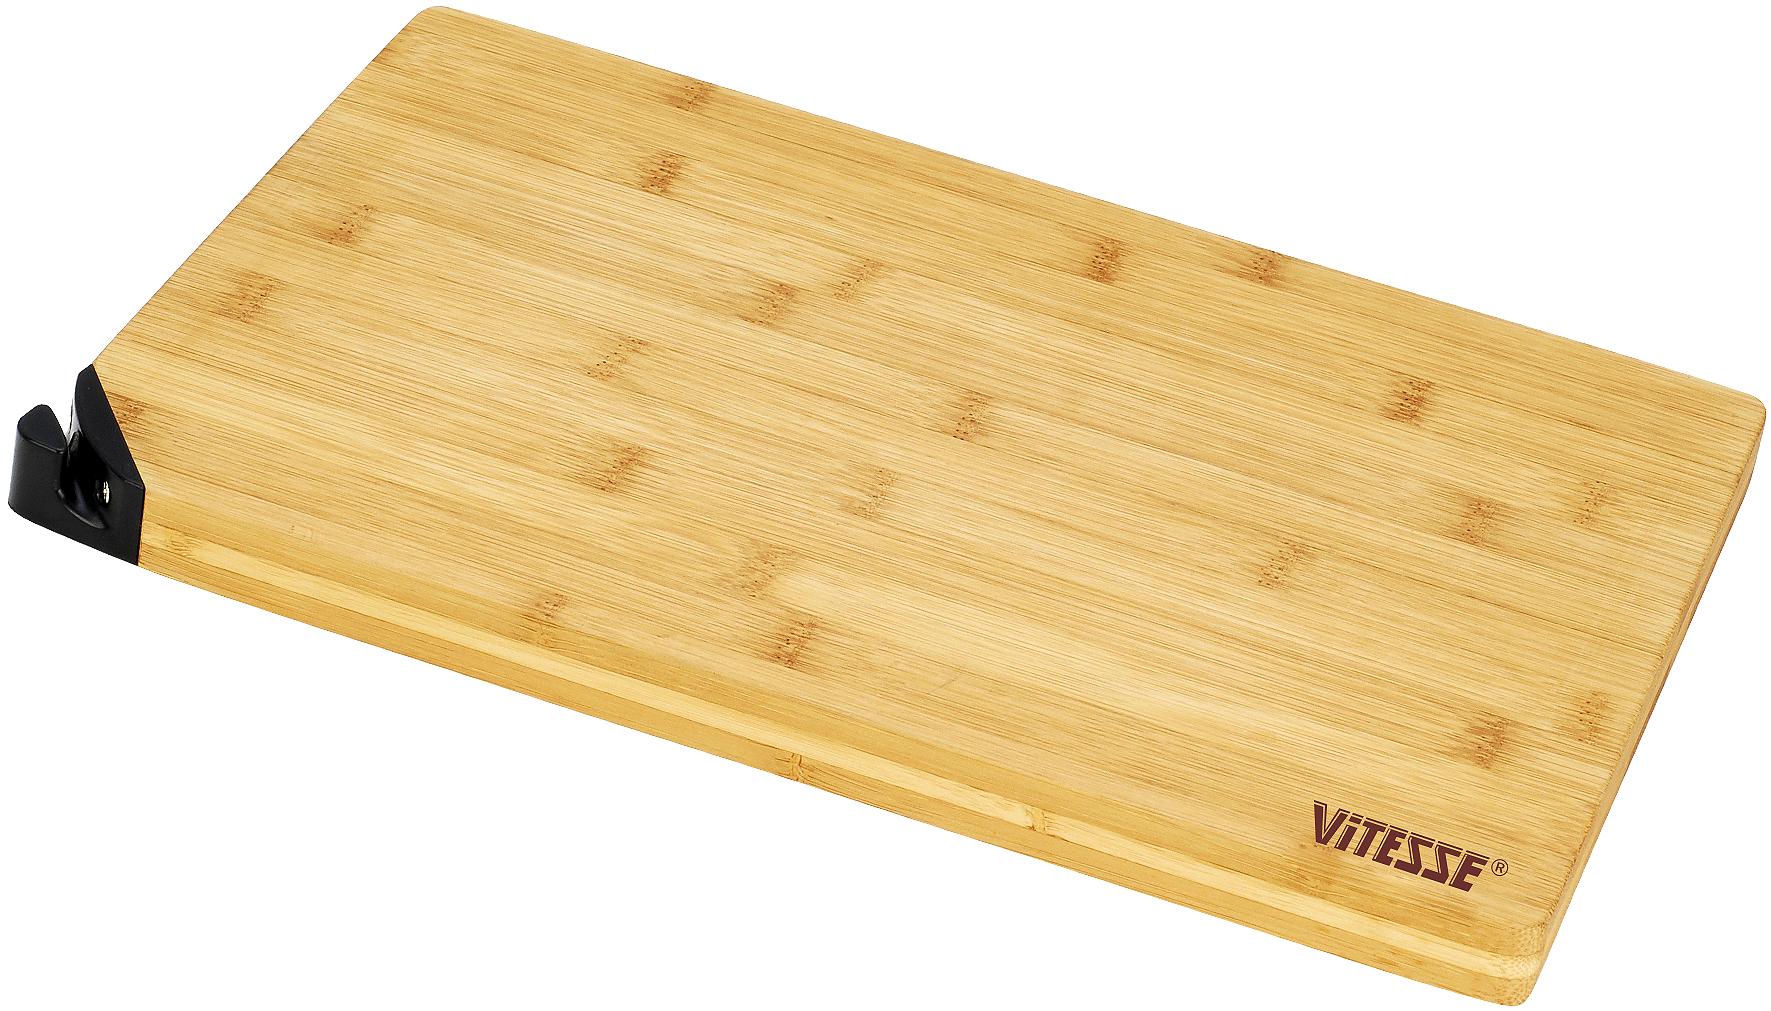 Доска разделочная Vitesse, со встроенной точилкой для ножа, 30 х 20 см ваза mughal l 20 х 20 х 30 см